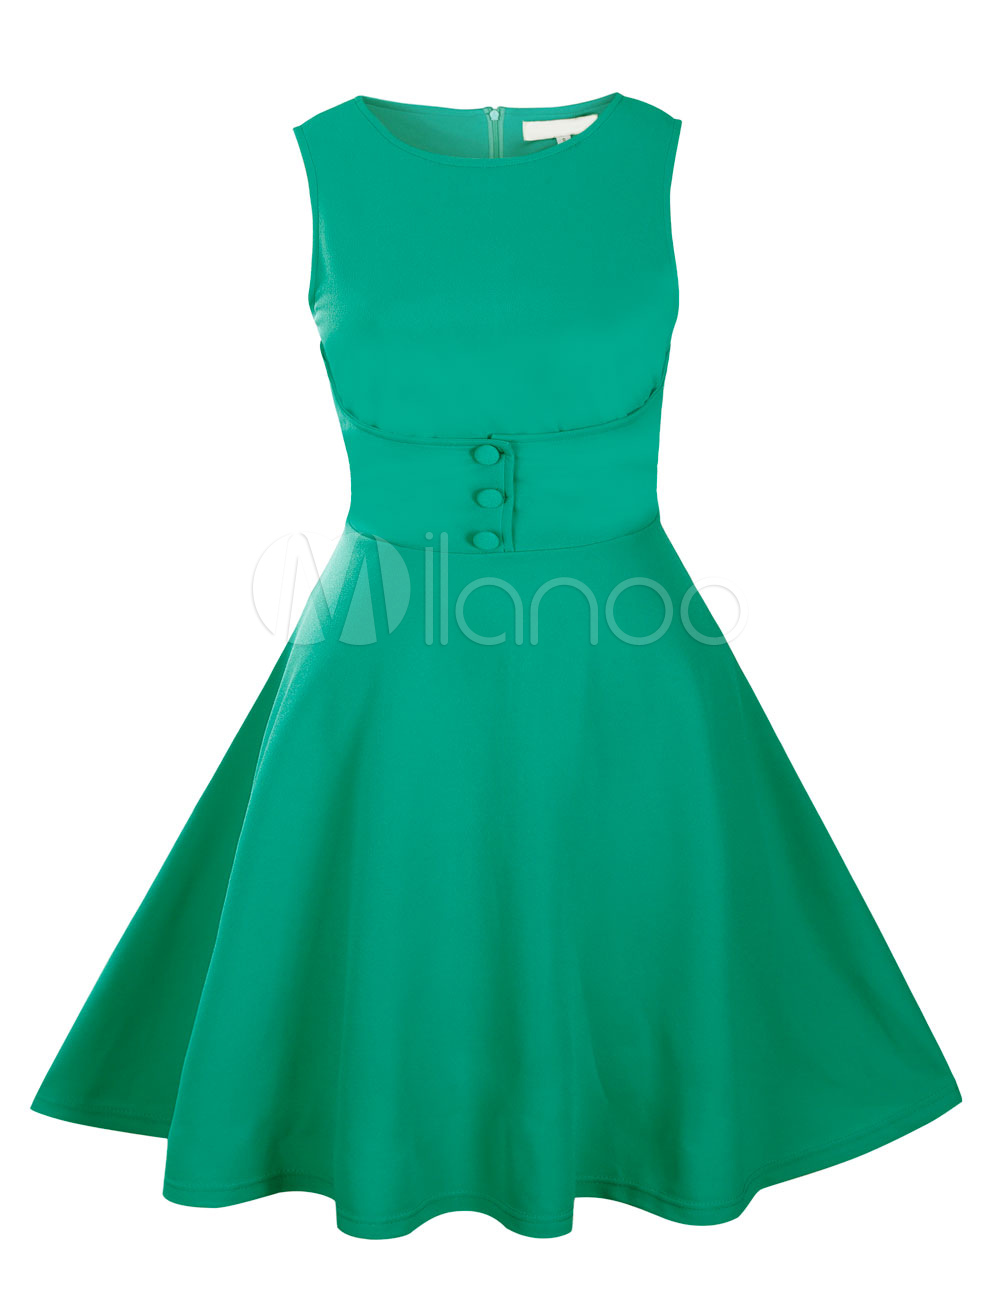 Green Vintage Dress Women's Sleeveless Buttons Deco Flare Retro Dress (Women\\'s Clothing Vintage Dresses) photo